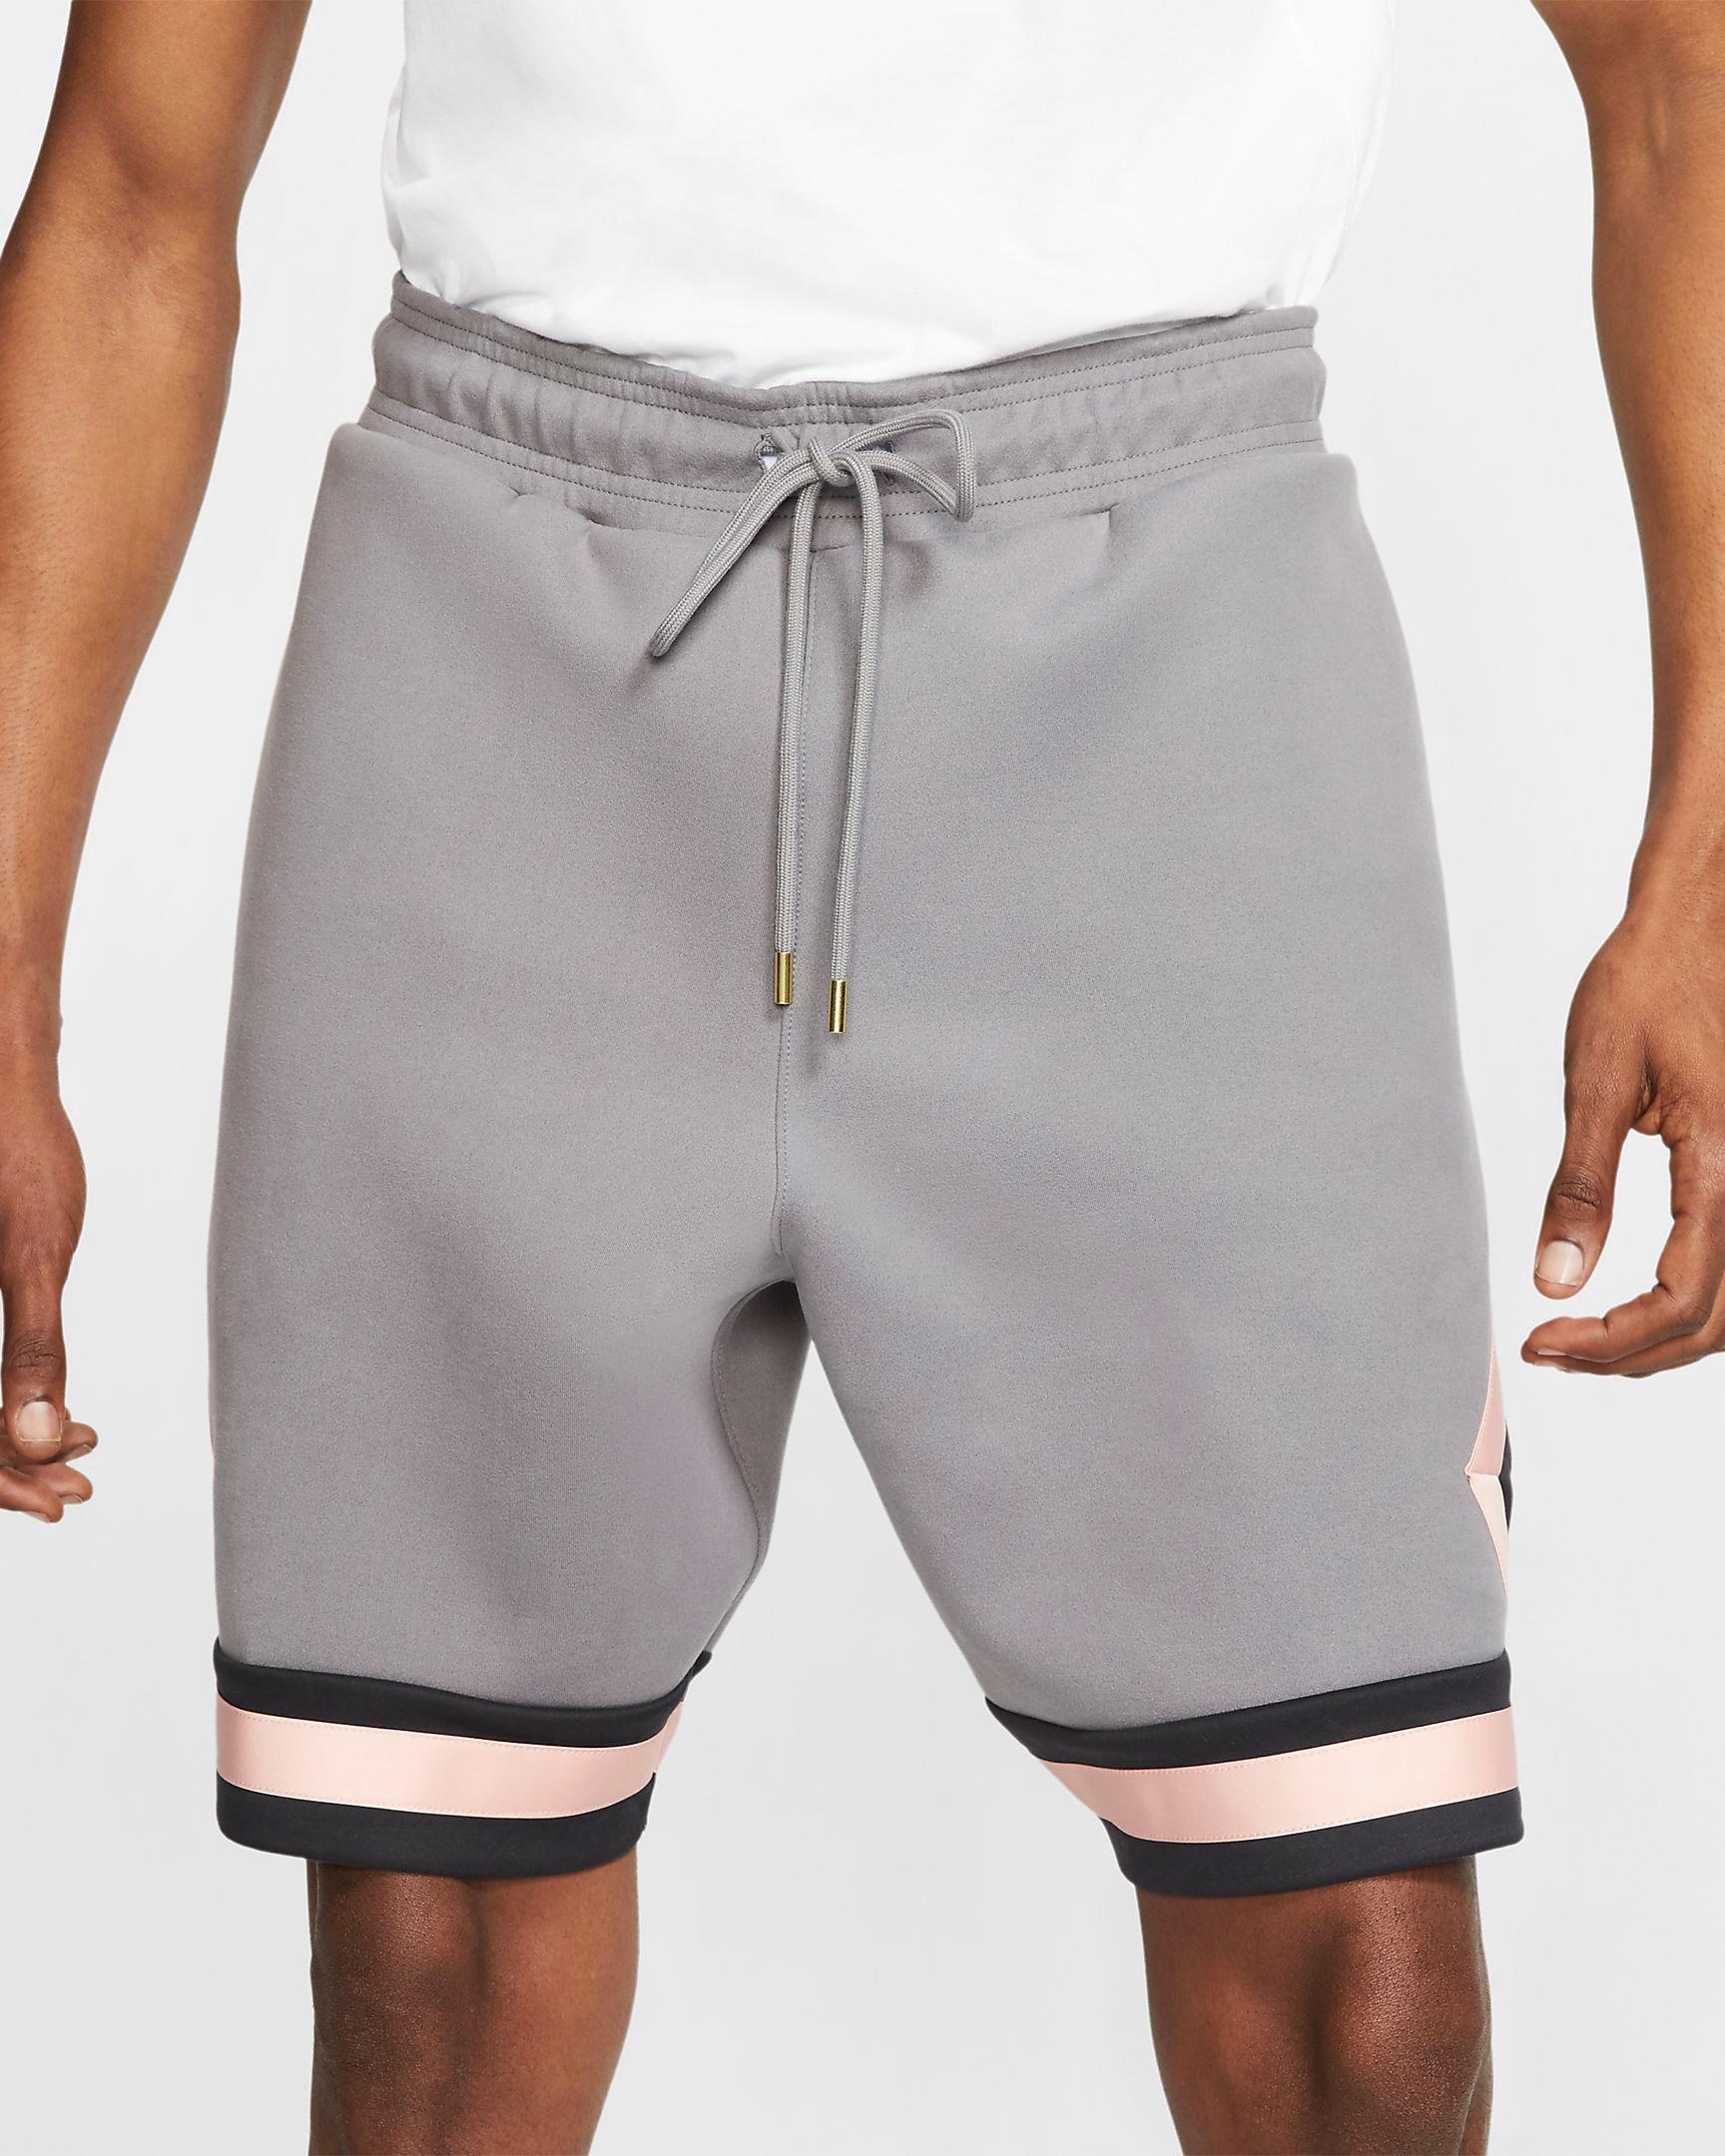 jordan-remastered-diamond-shorts-grey-pink-1